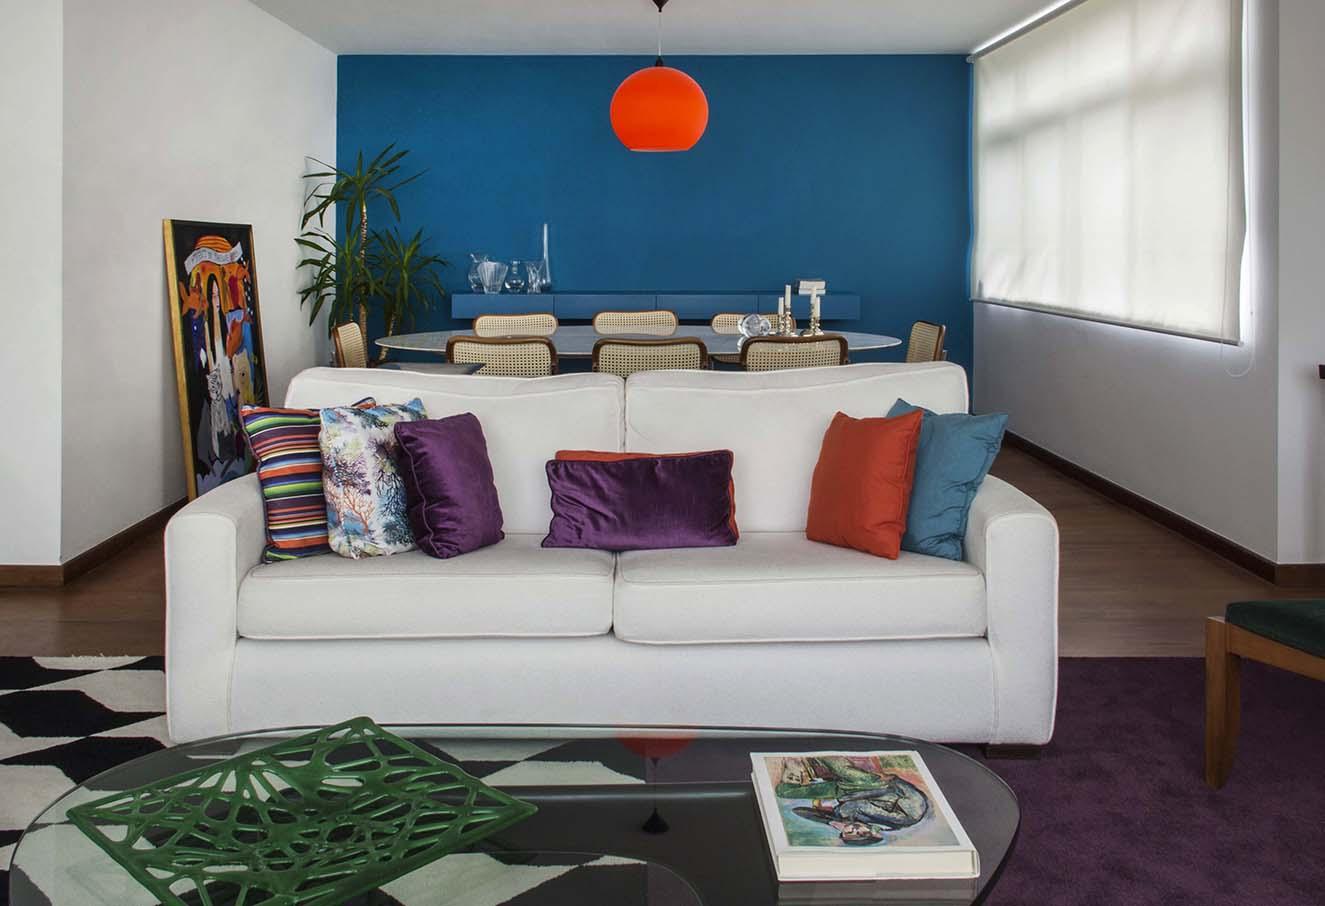 Salas coloridas decoradas dicas fotos - Fotos d salas ...